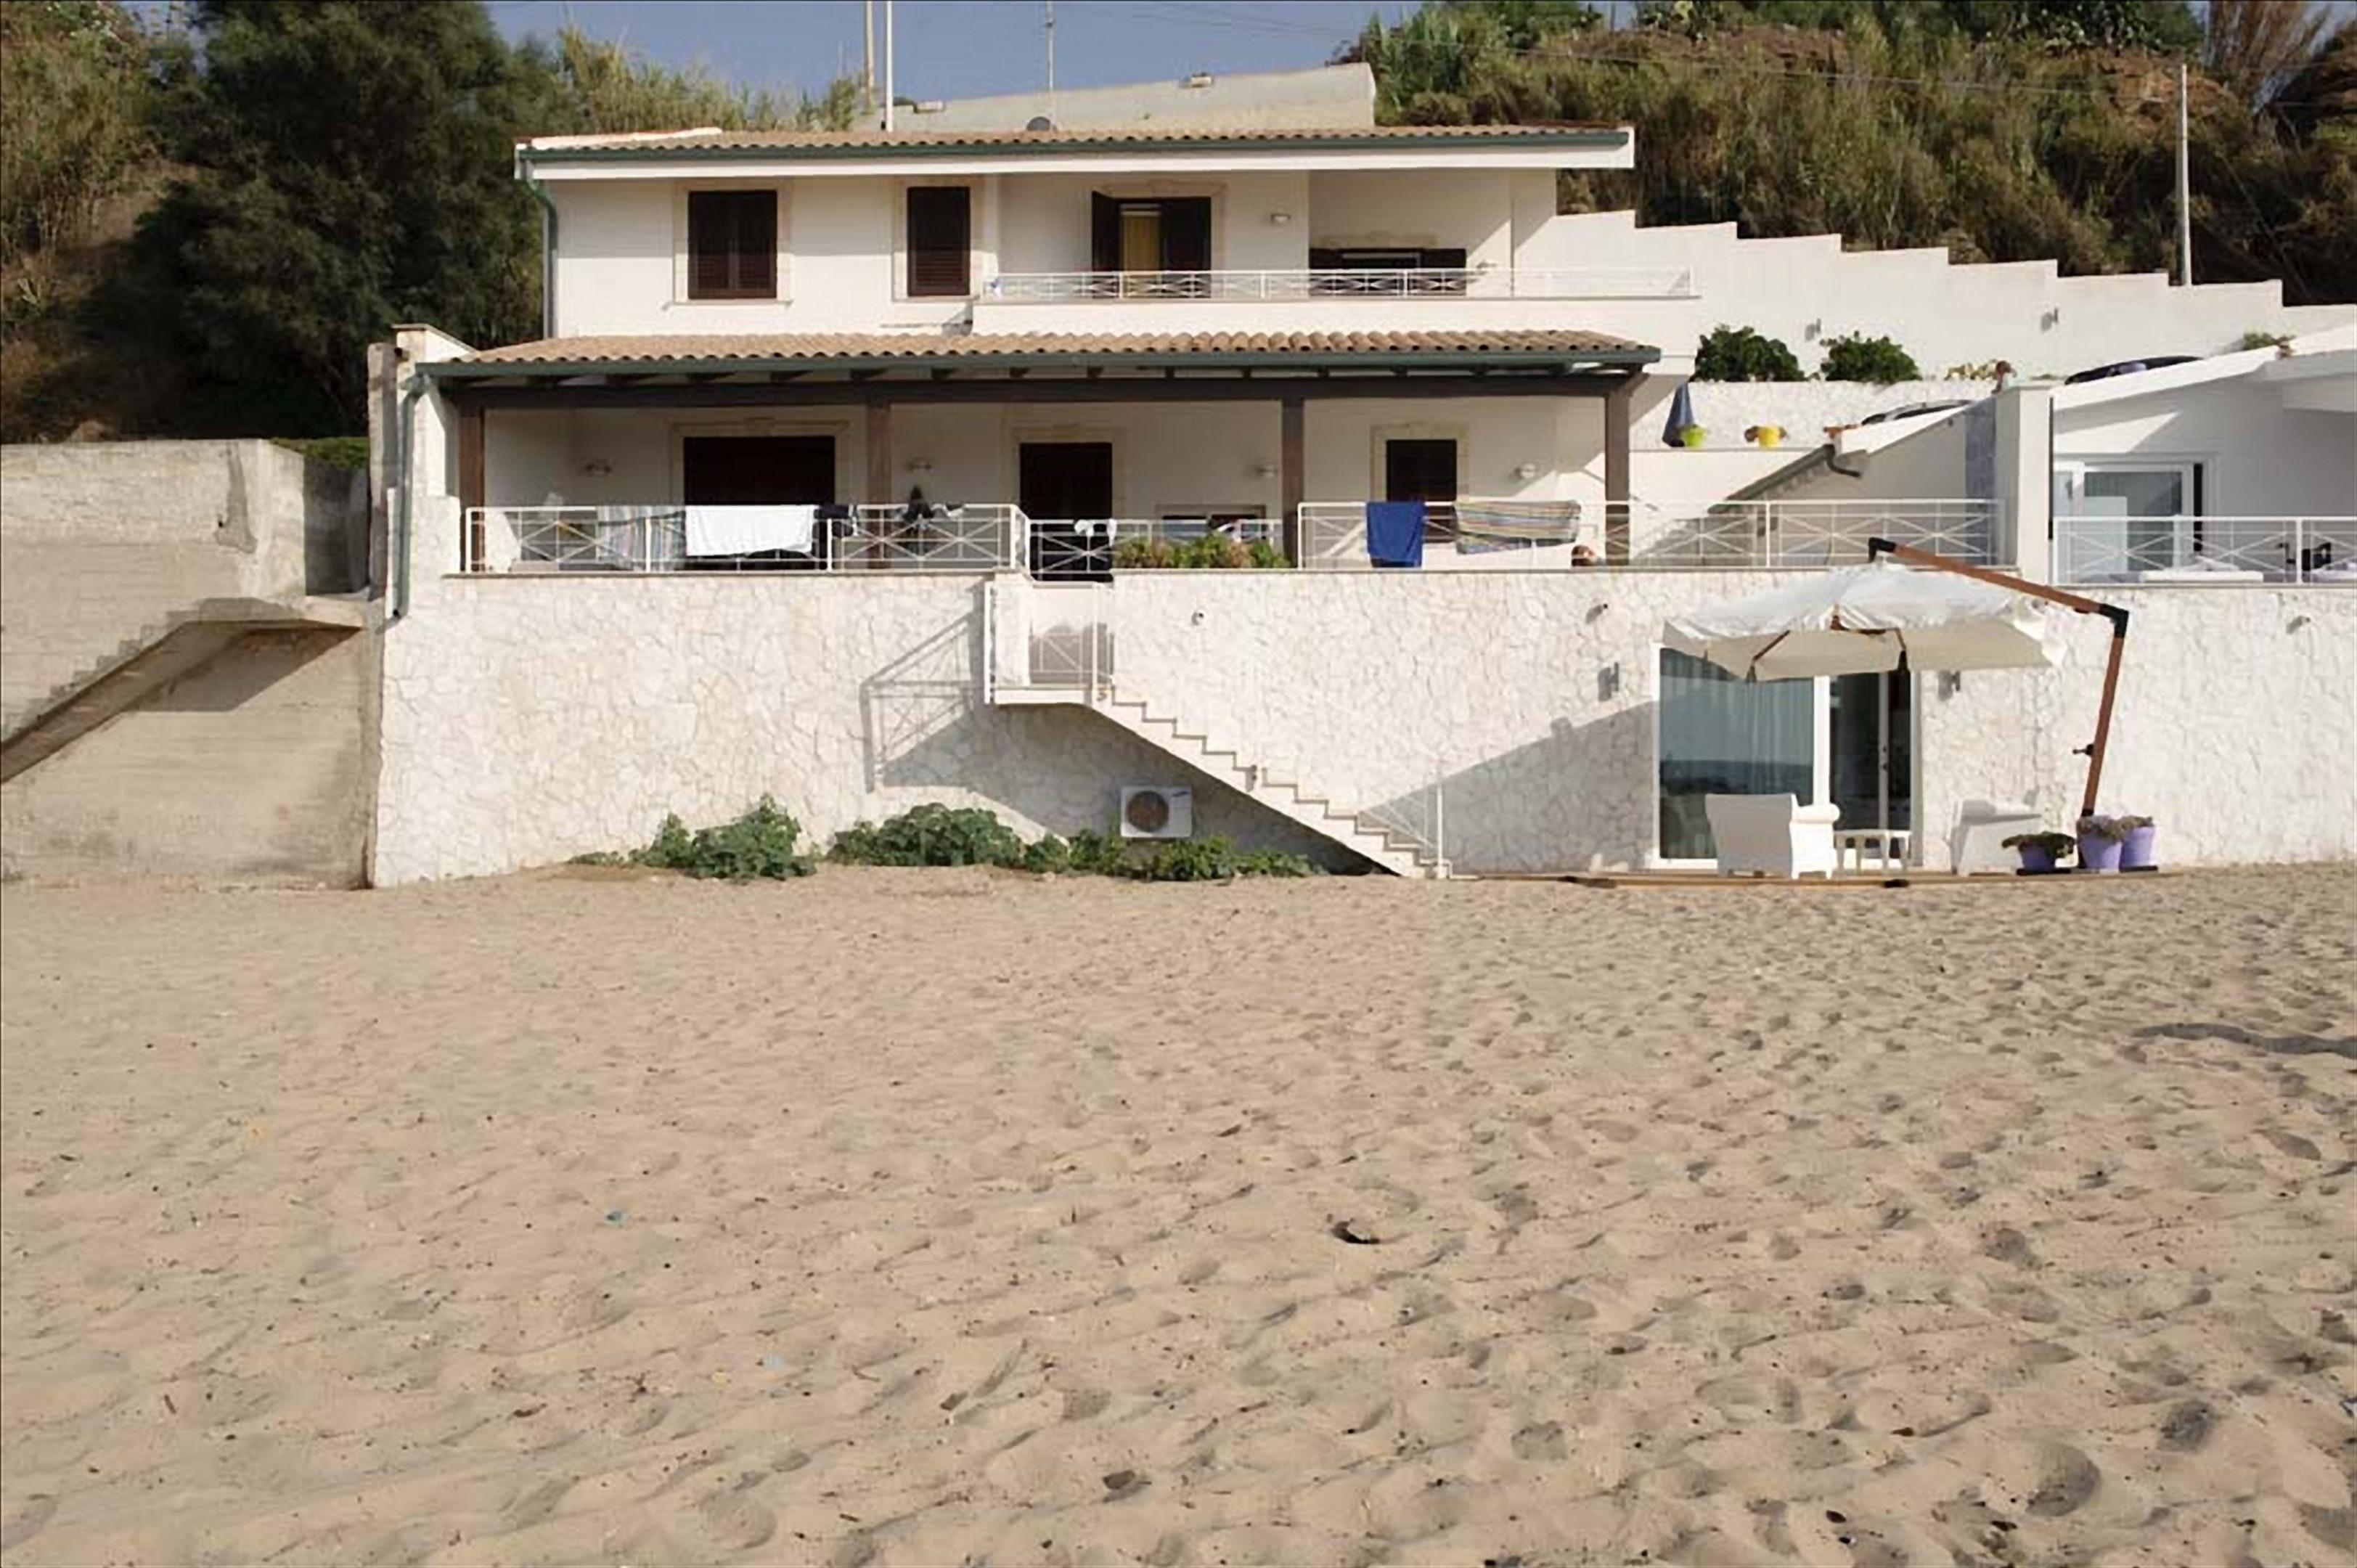 Holiday apartment Wohnung mit 3 Schlafzimmern in Piano di Trappeto mit herrlichem Meerblick, möblierter Terr (2271436), Balestrate, Palermo, Sicily, Italy, picture 27